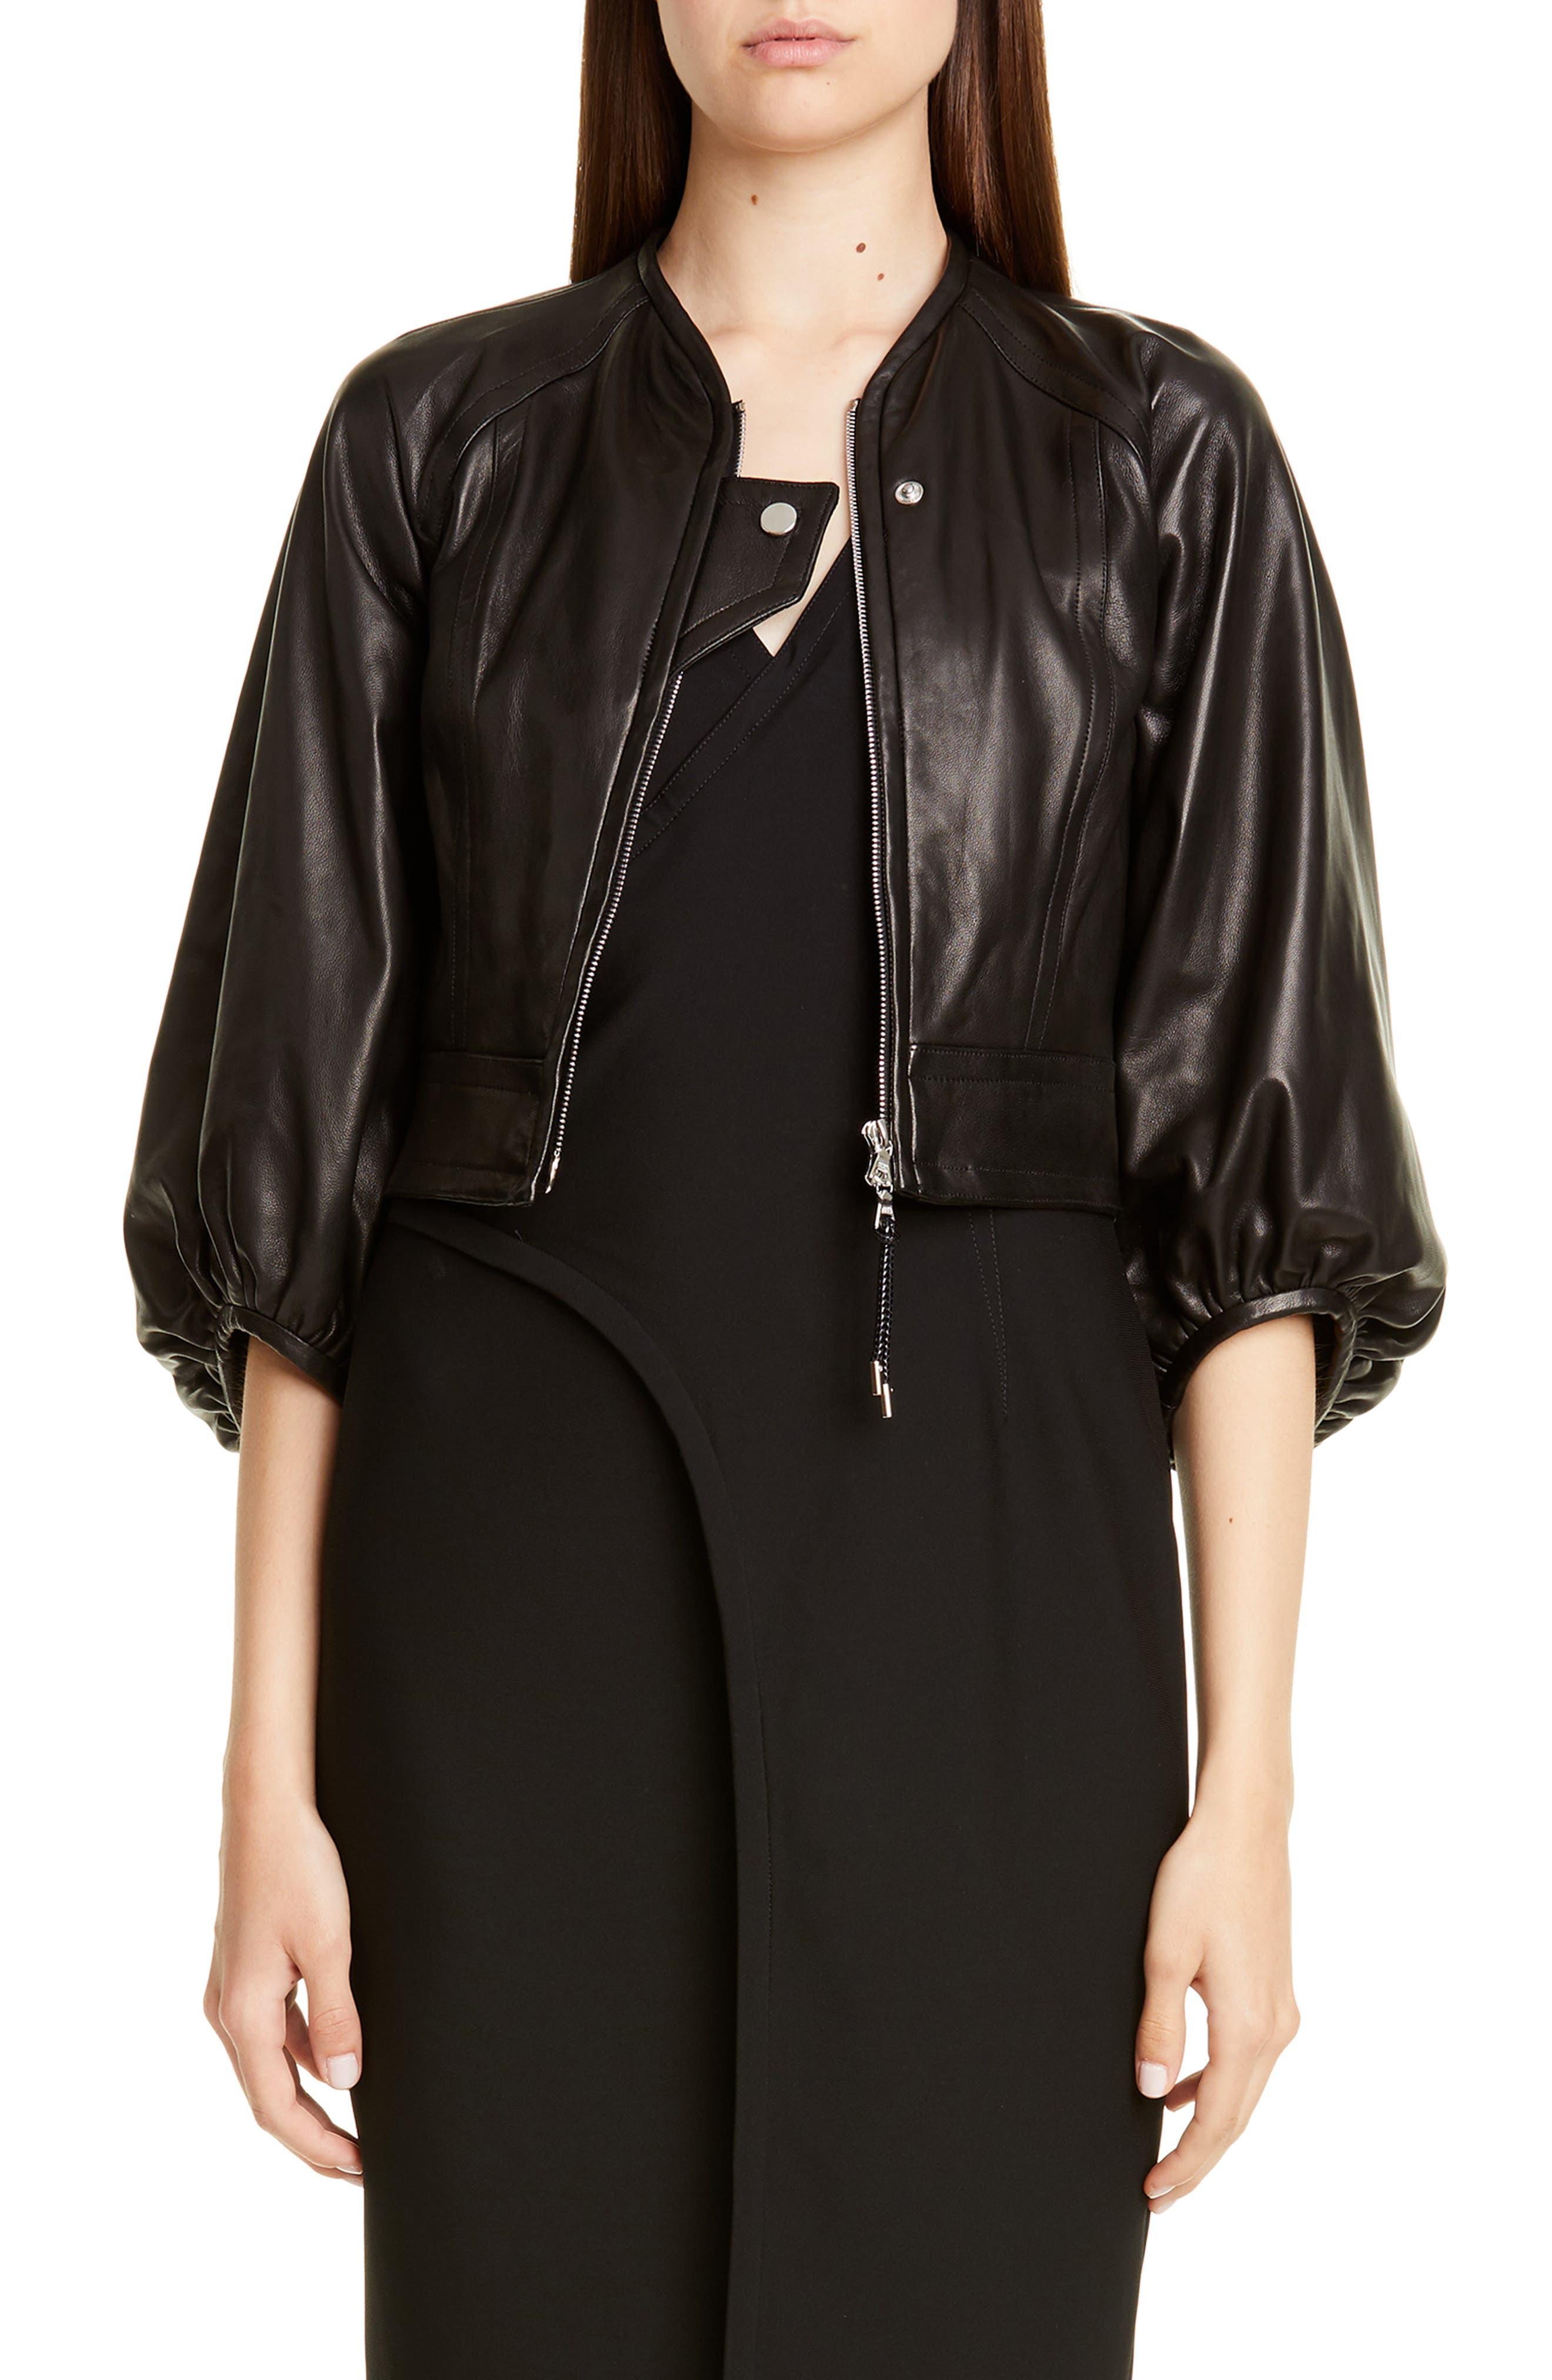 Yigal Azrouel Mechanical Stretch Dress, Black